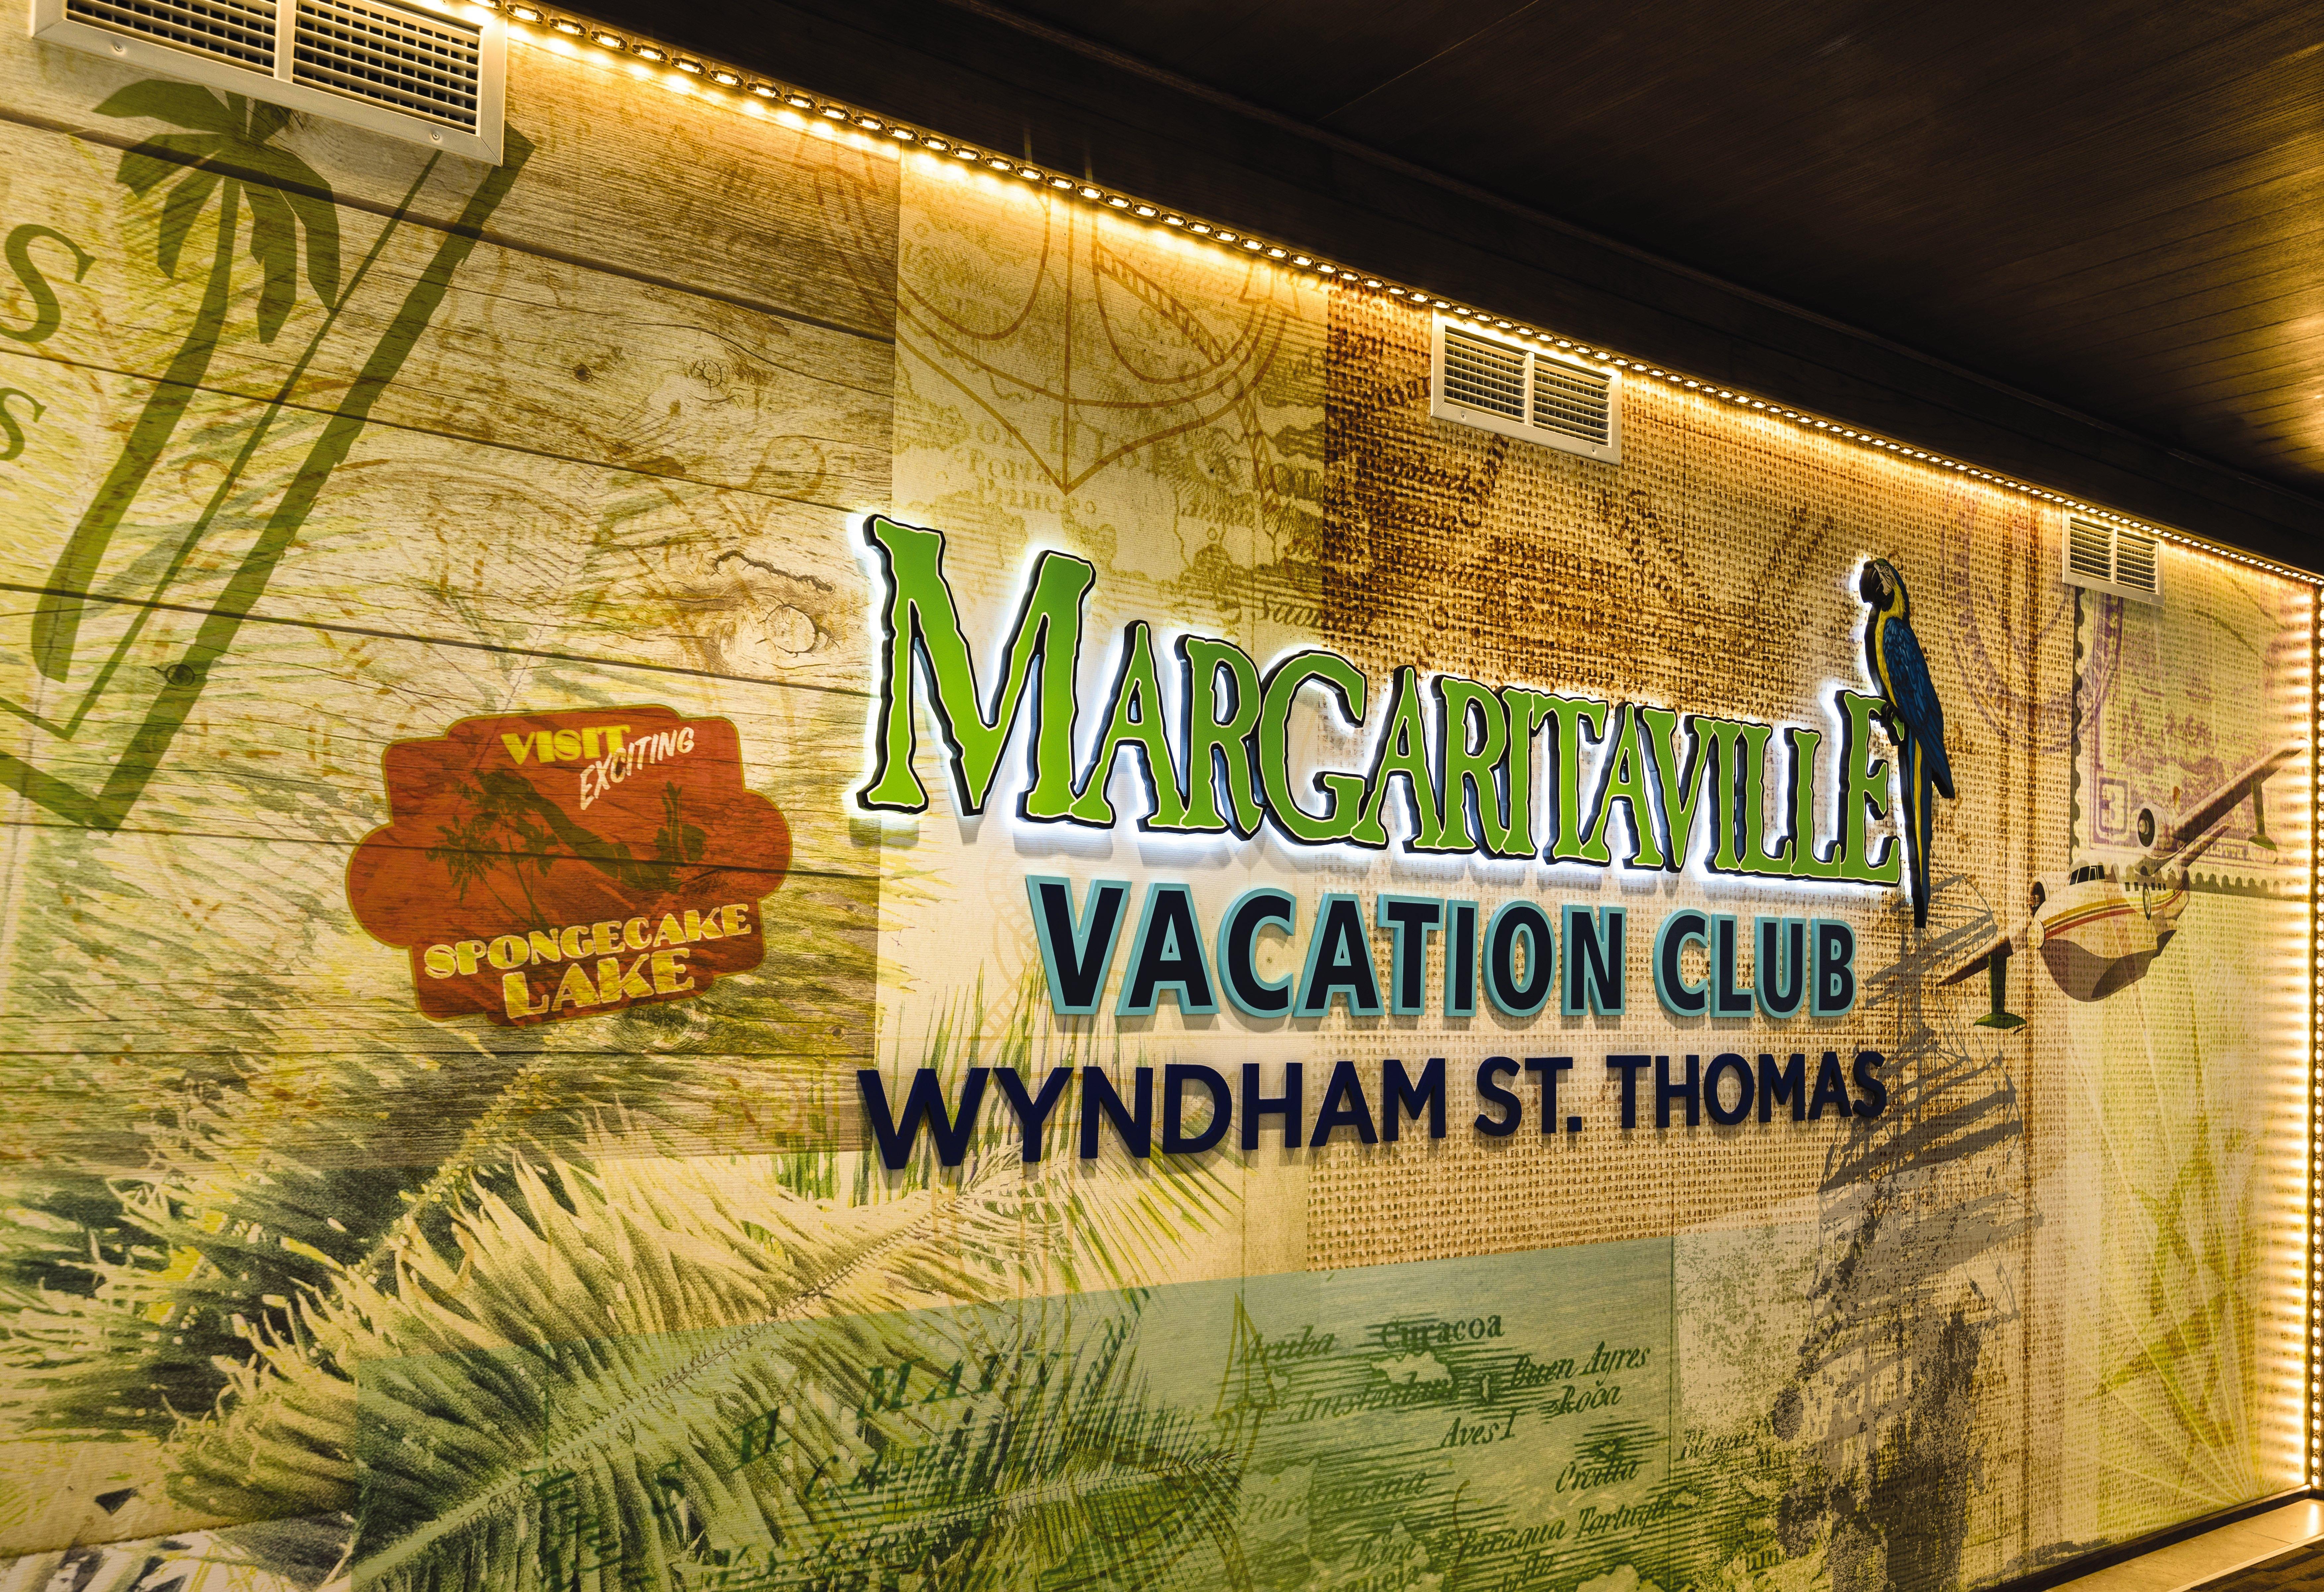 Margaritaville Vacation Club by Wyndham